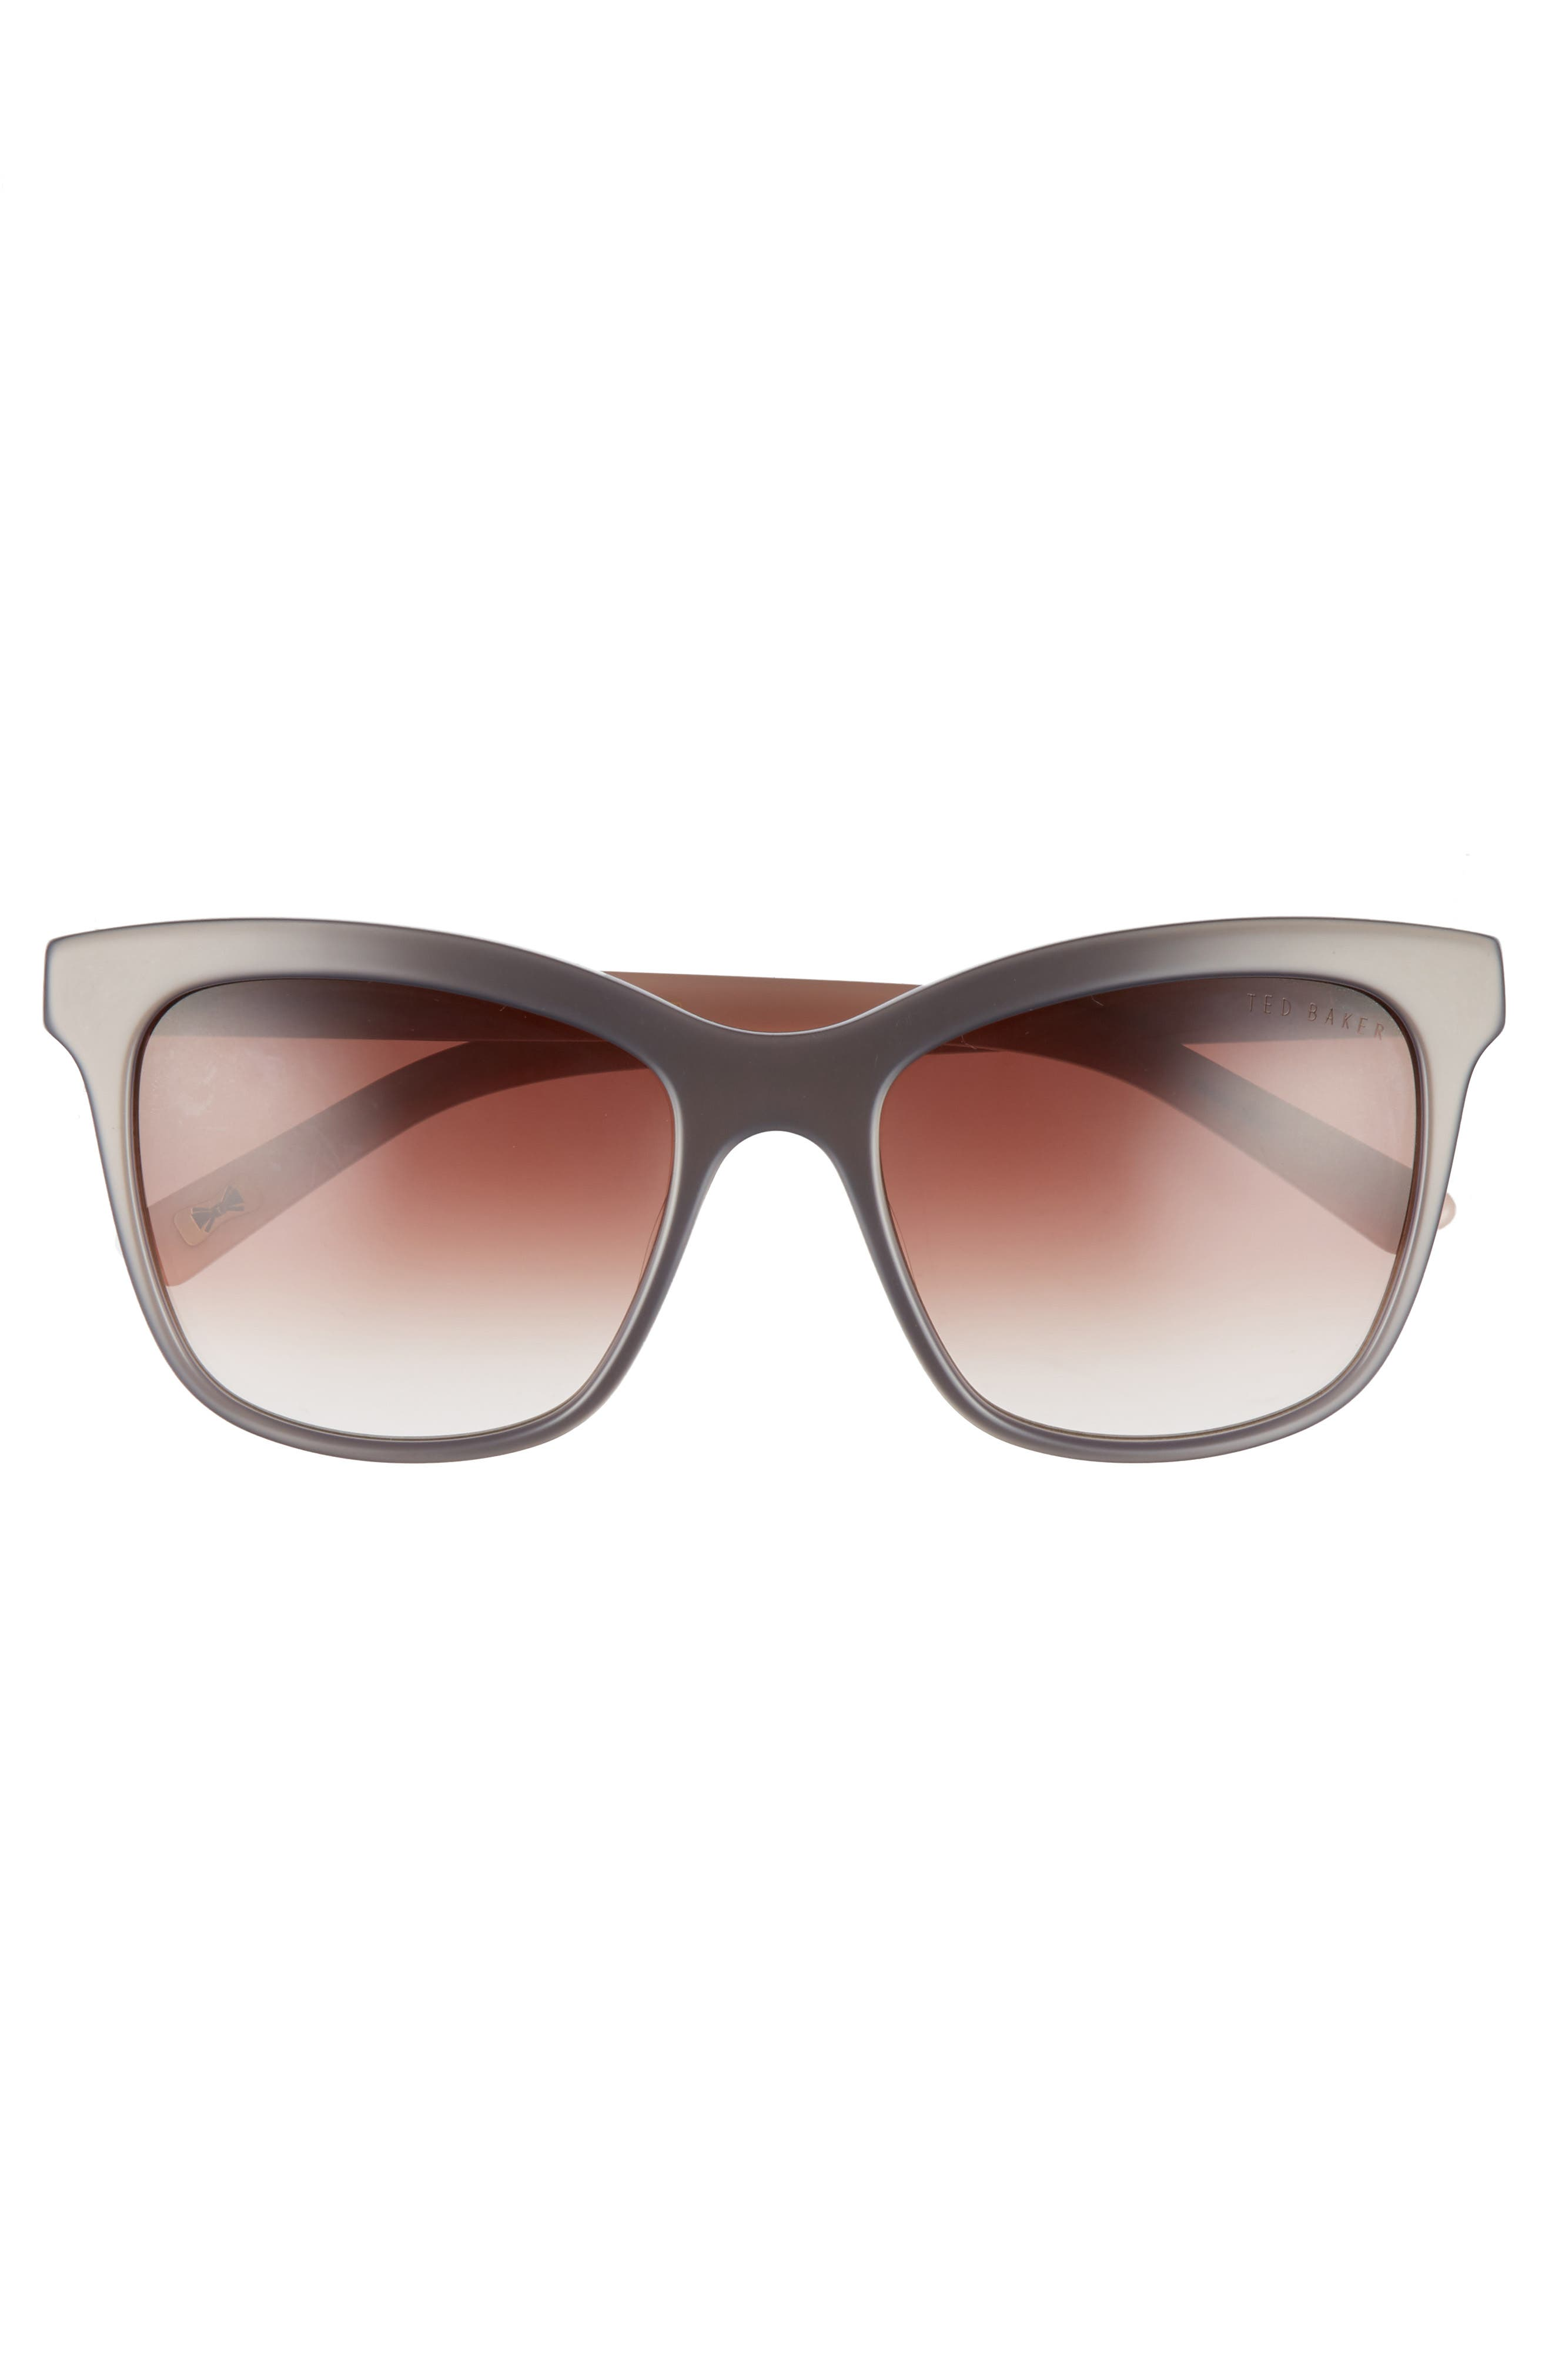 55mm Cat Eye Sunglasses,                             Alternate thumbnail 3, color,                             GREY